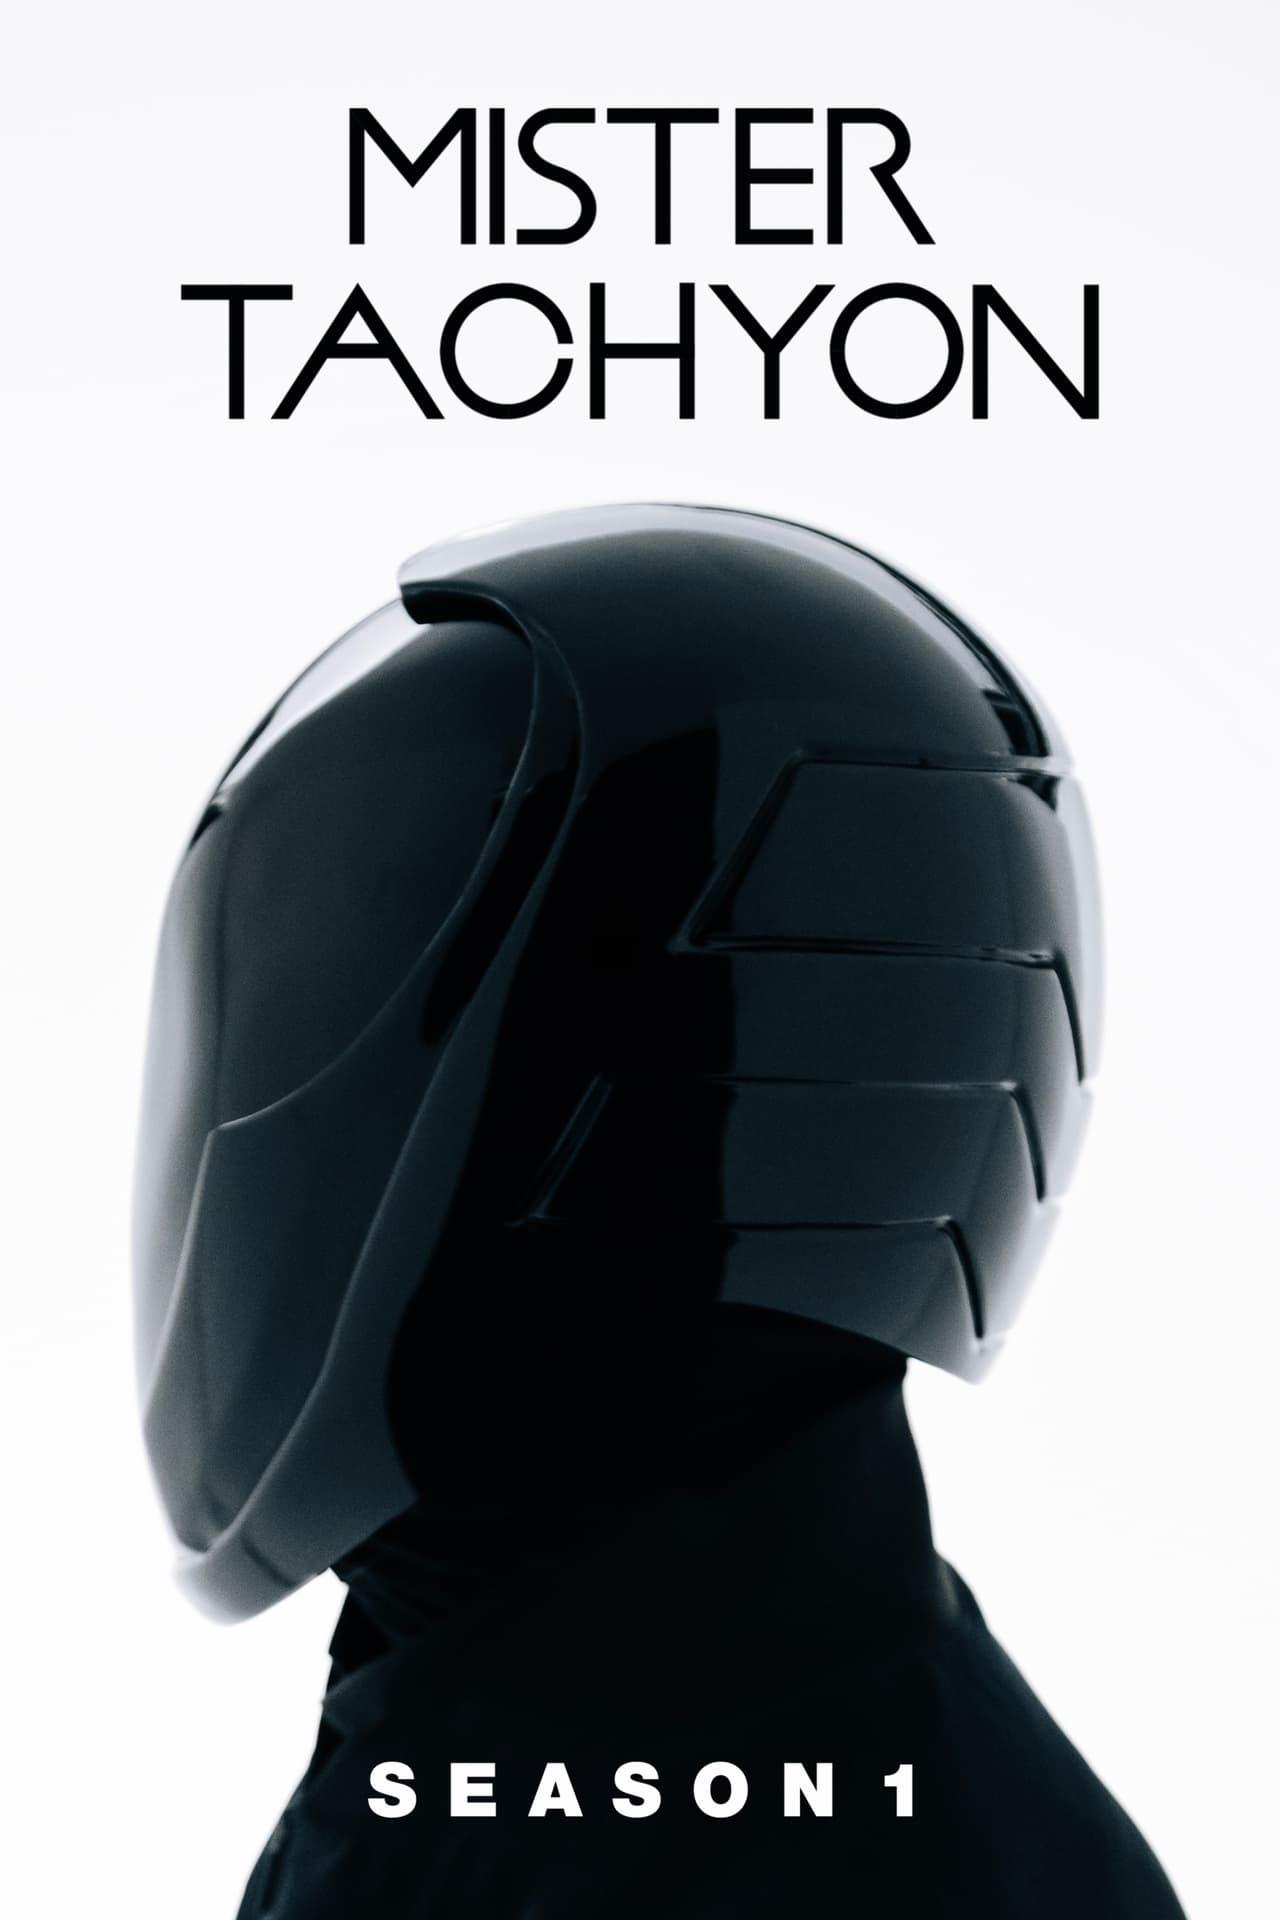 Putlocker Mister Tachyon Season 1 (2018)